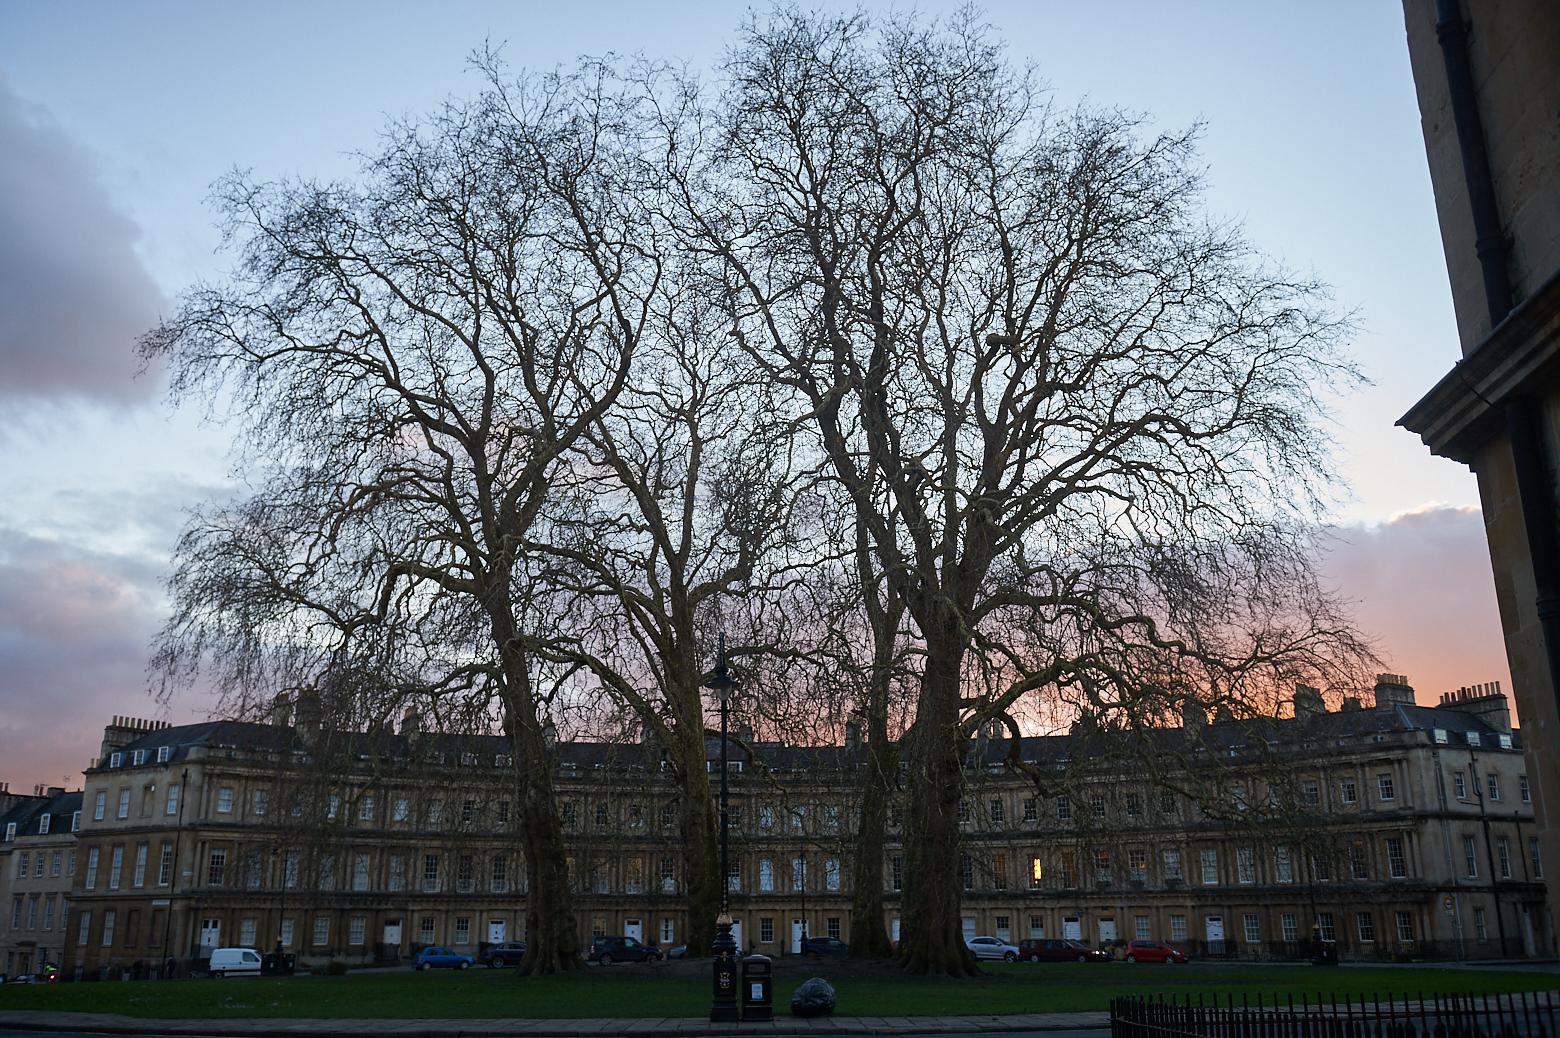 bath, somerset, england, jane austen, town, uk, photos and the city, ursula travels, sunset, the circus